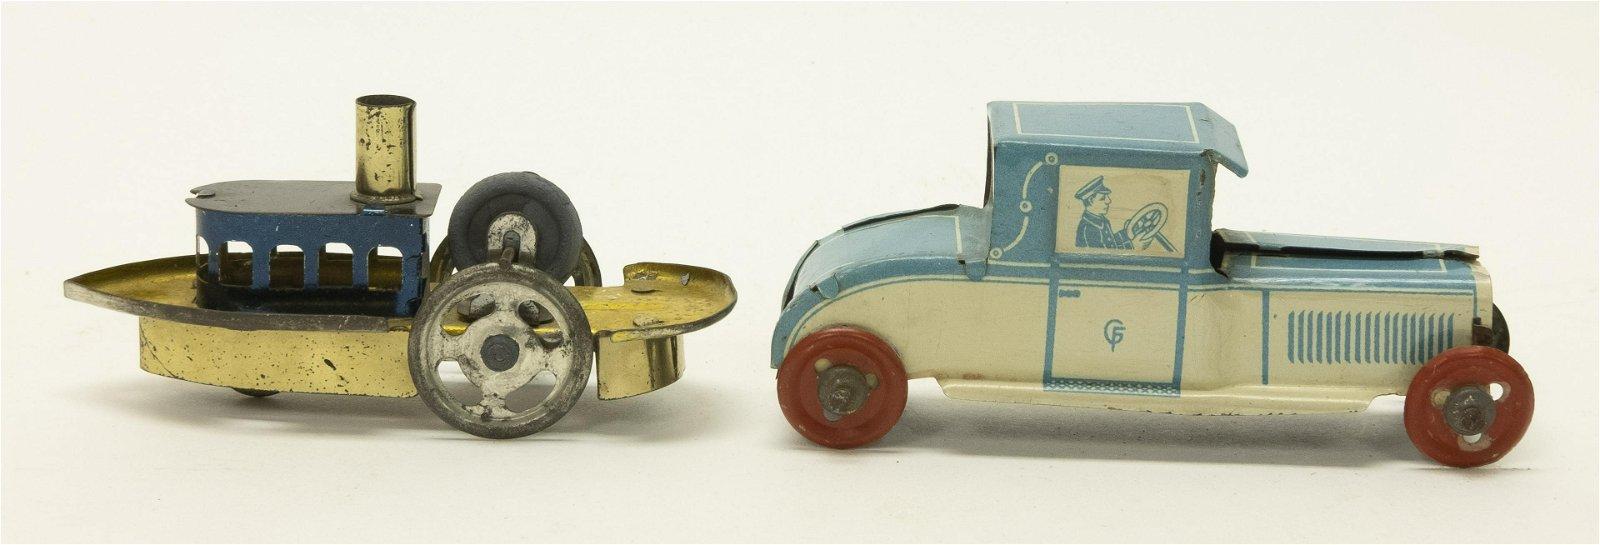 Tug Boat & Automobile Penny Toys